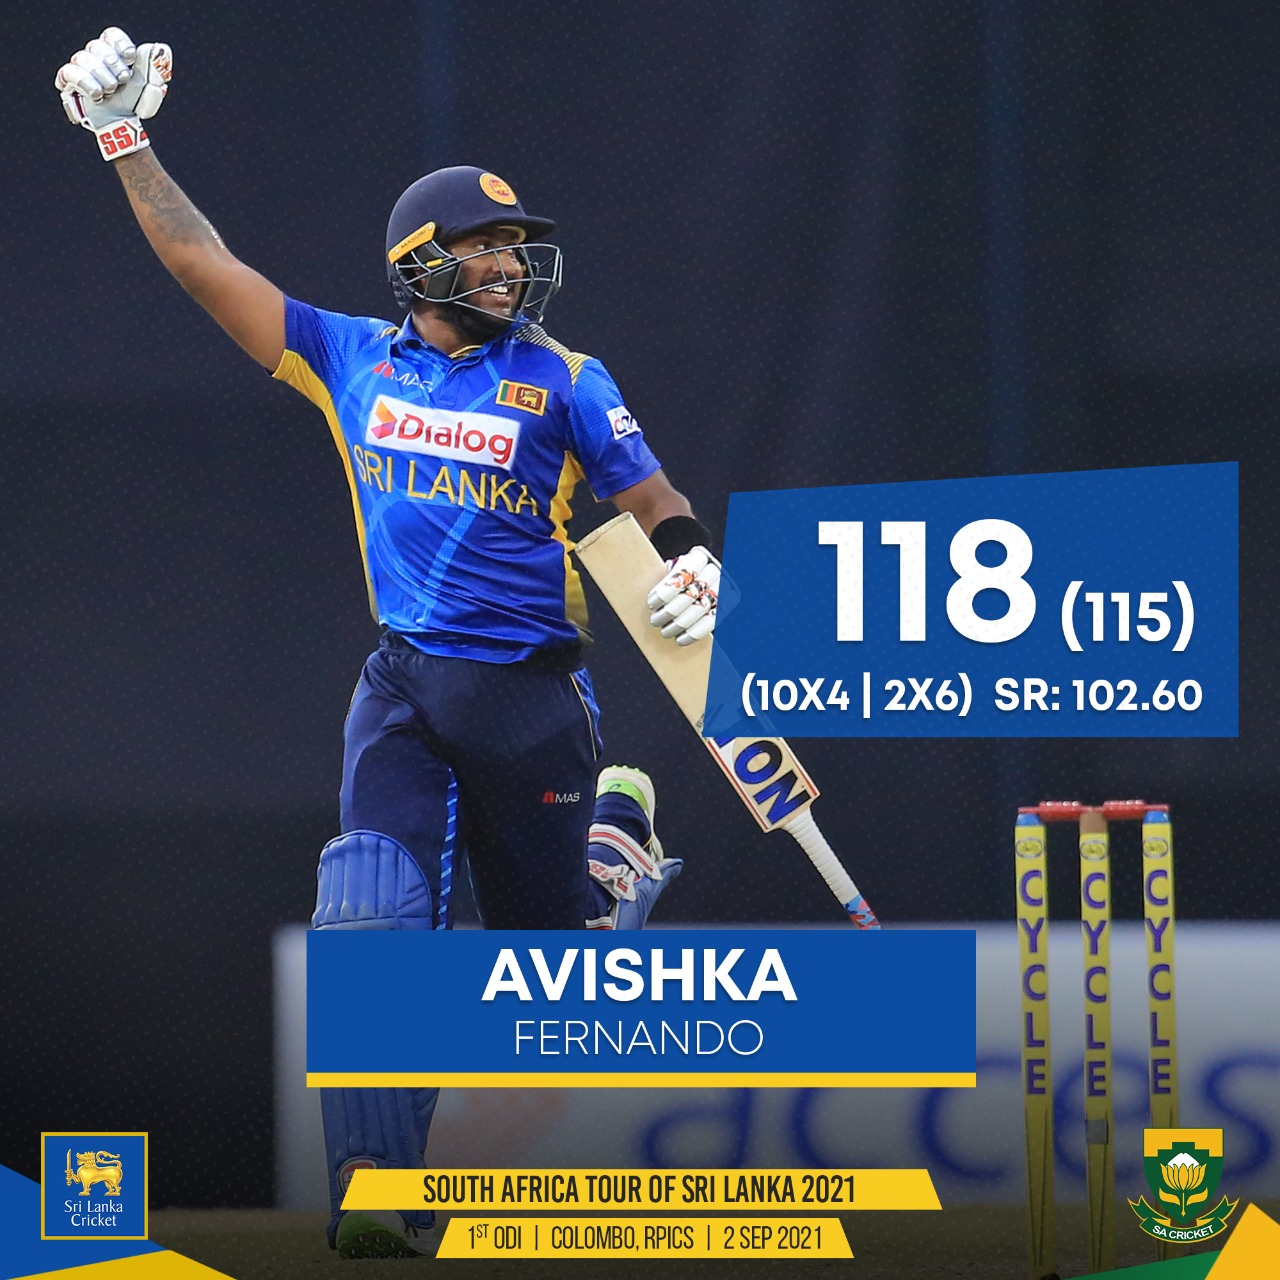 Sri Lanka defeat South Africa to take series lead